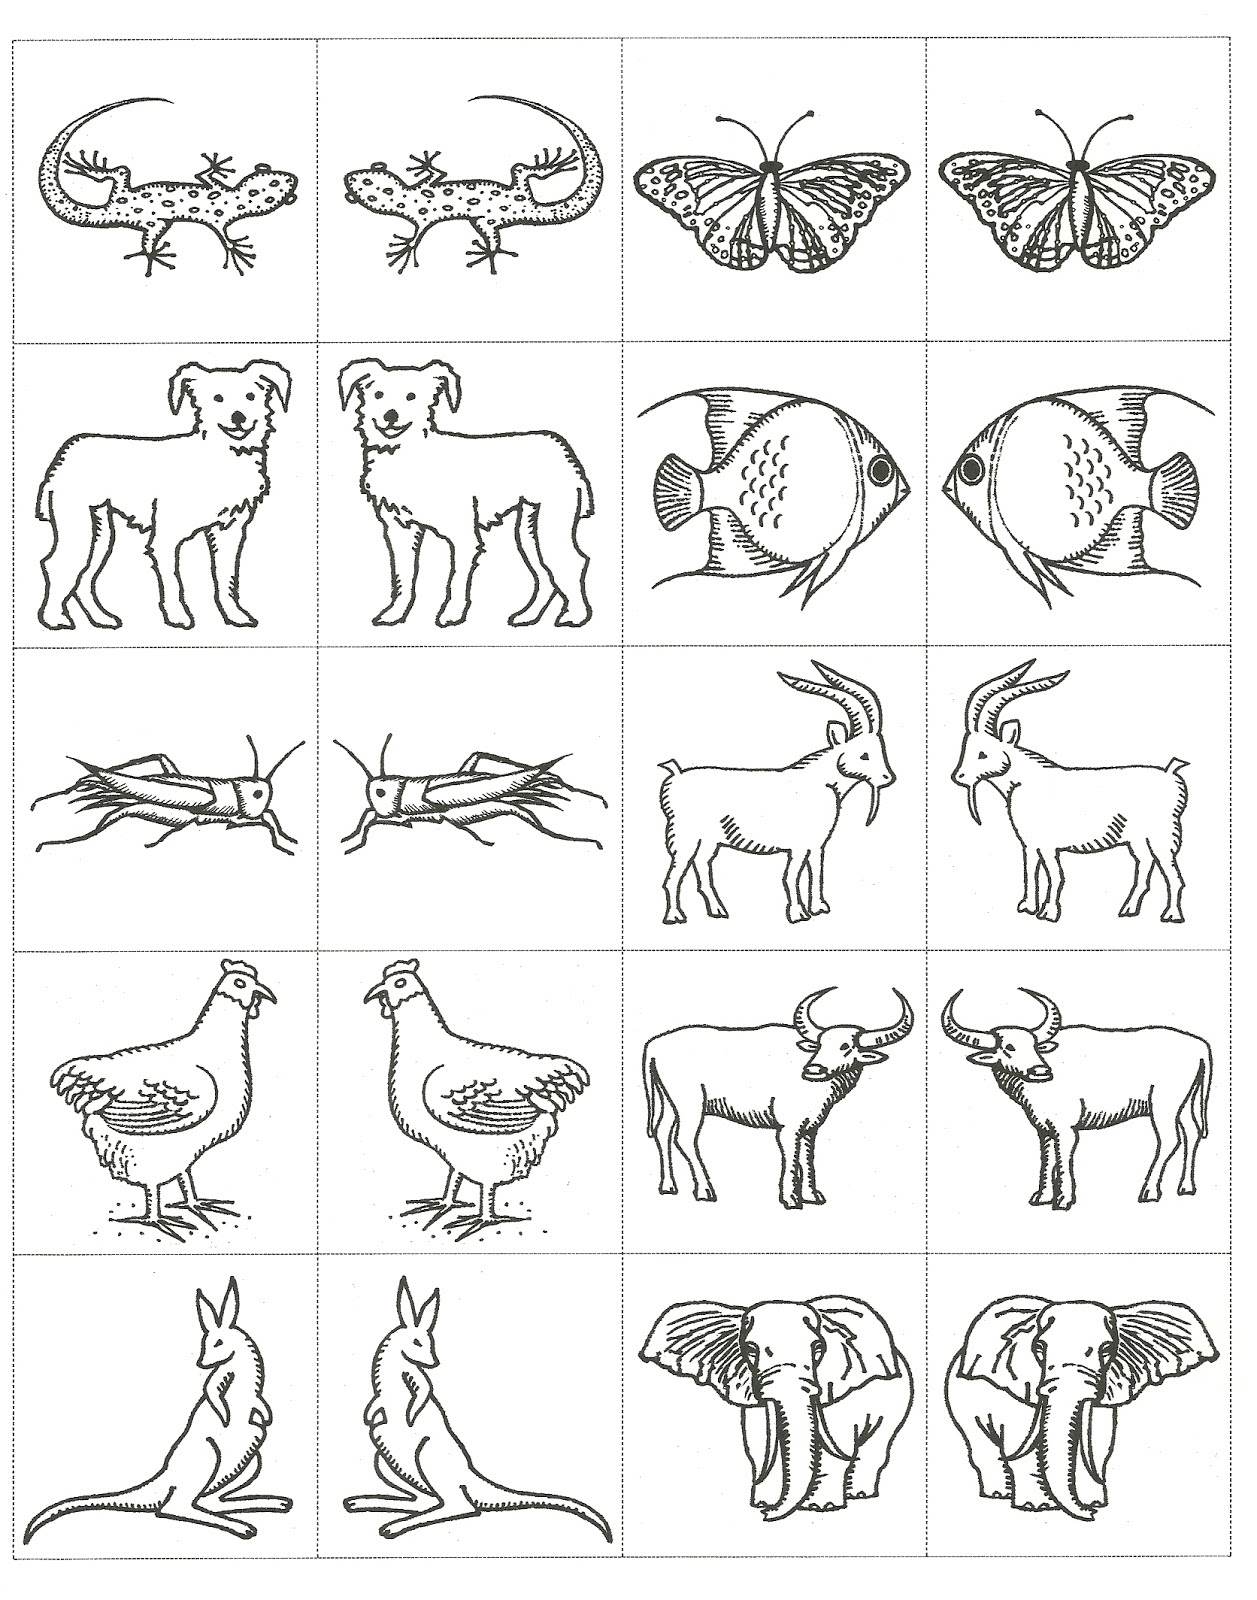 Noahs Ark Drawing at GetDrawings | Free download